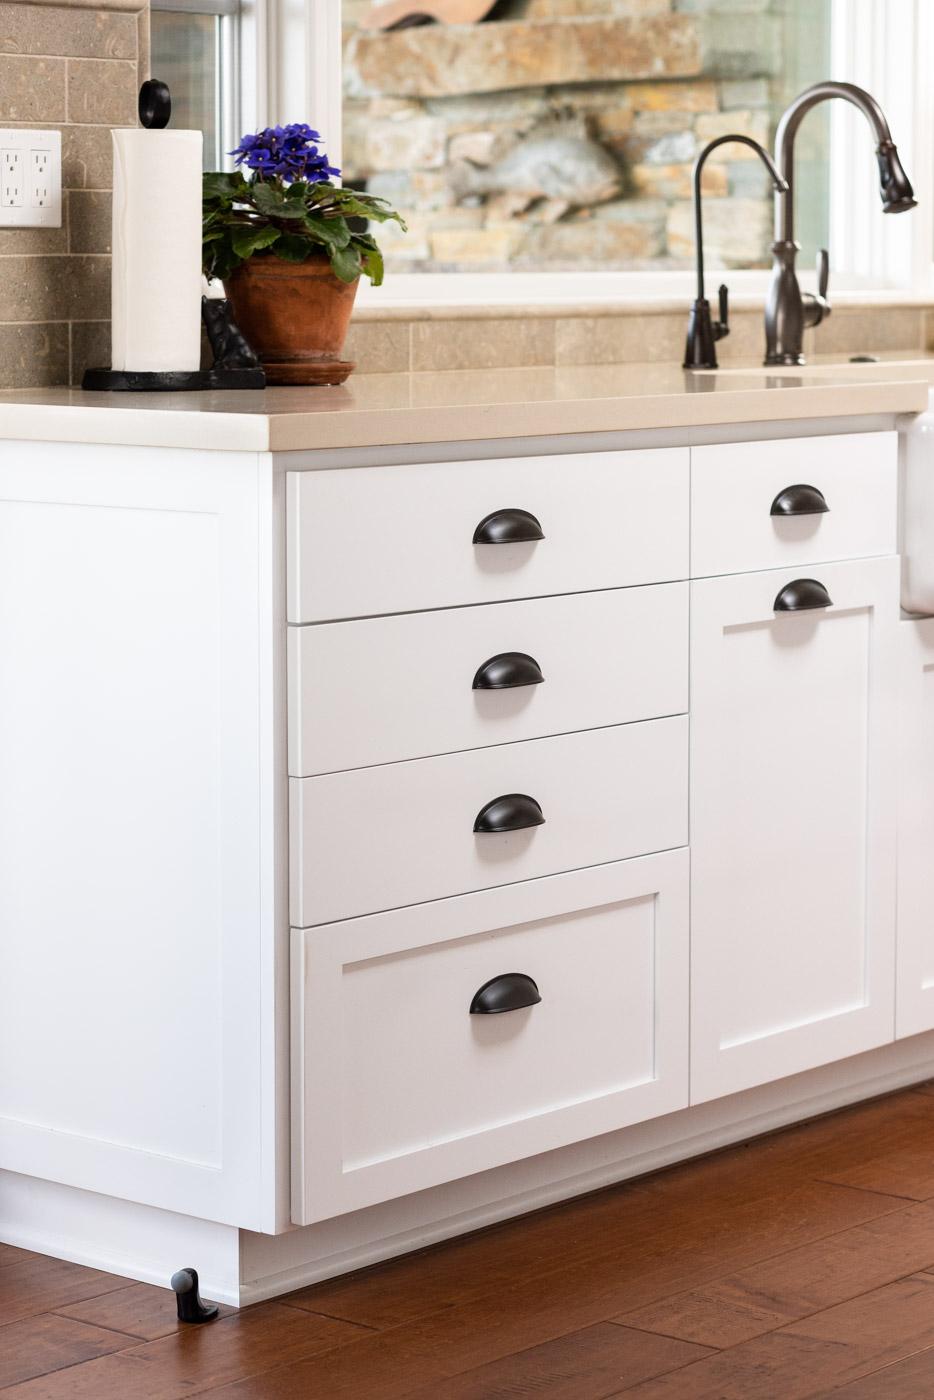 Coastal Craftsman kitchen with custom white painted shaker cabinets